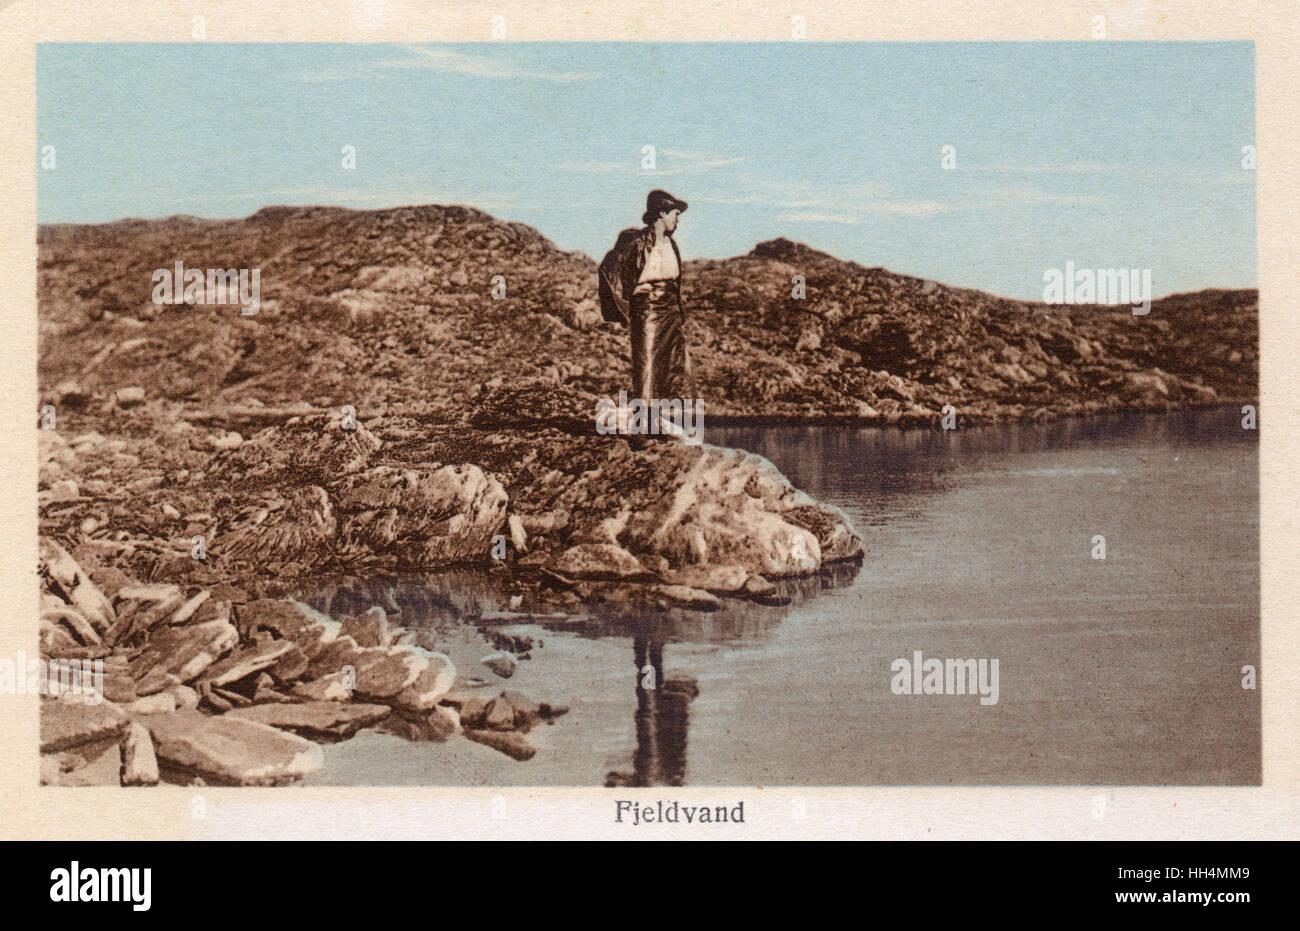 Fjeldvand (Fjeld Vand, Fjellvatnet), Norway. - Stock Image